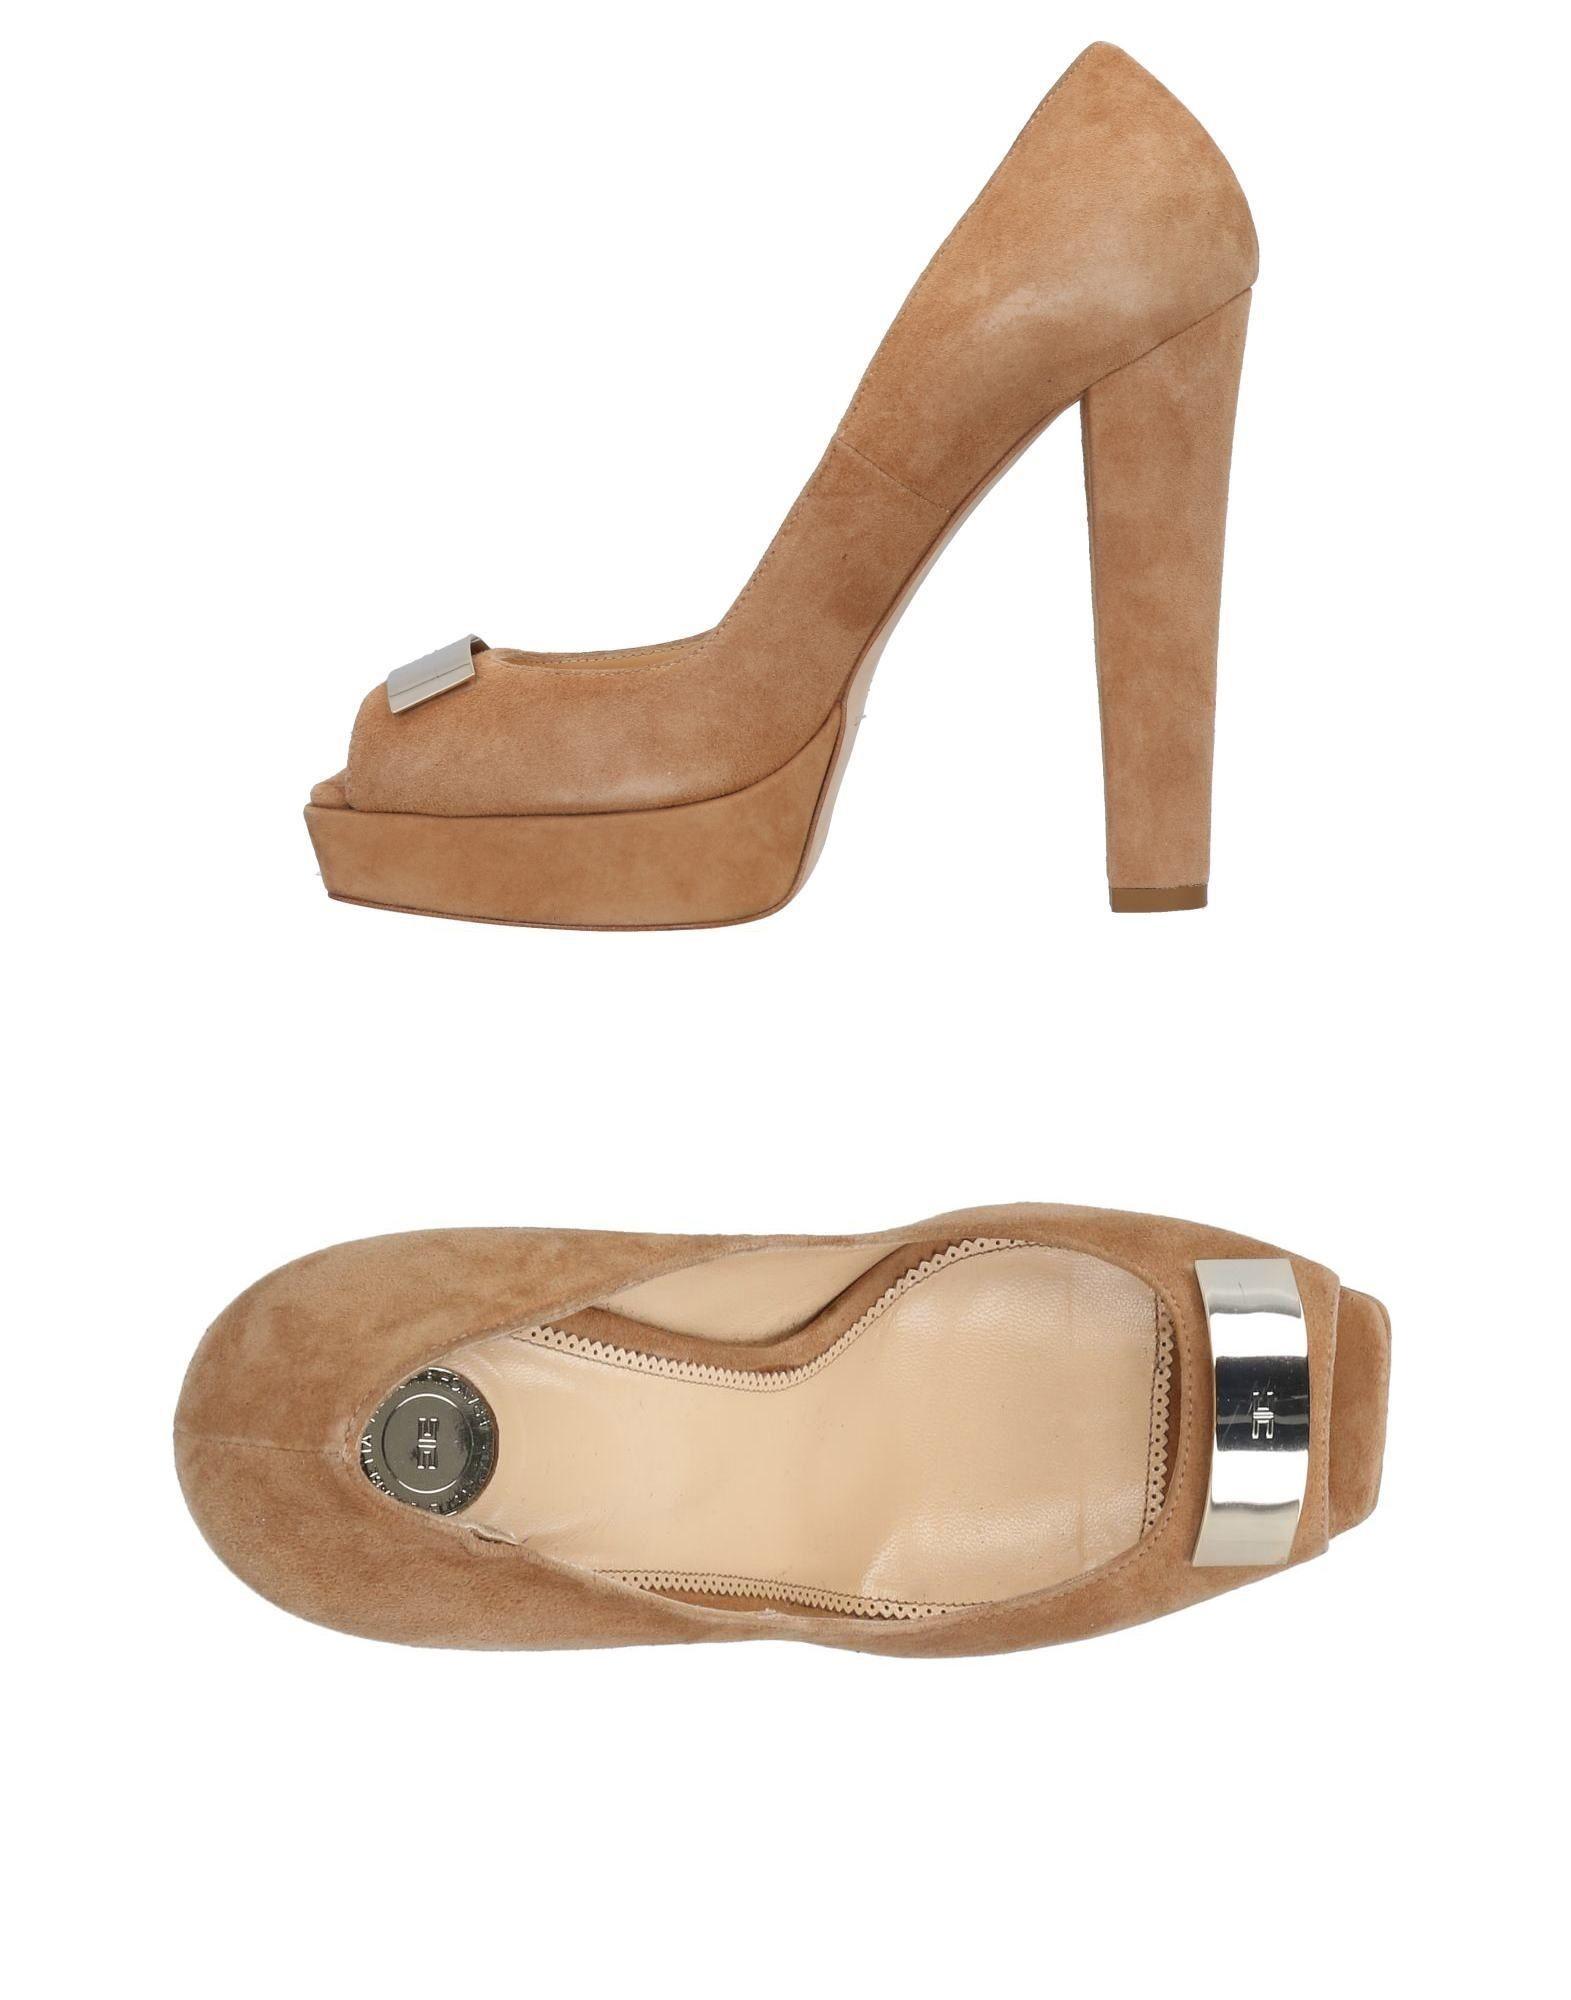 Elisabetta Franchi Pumps Schuhe Damen  11168934RS Neue Schuhe Pumps 7b2838